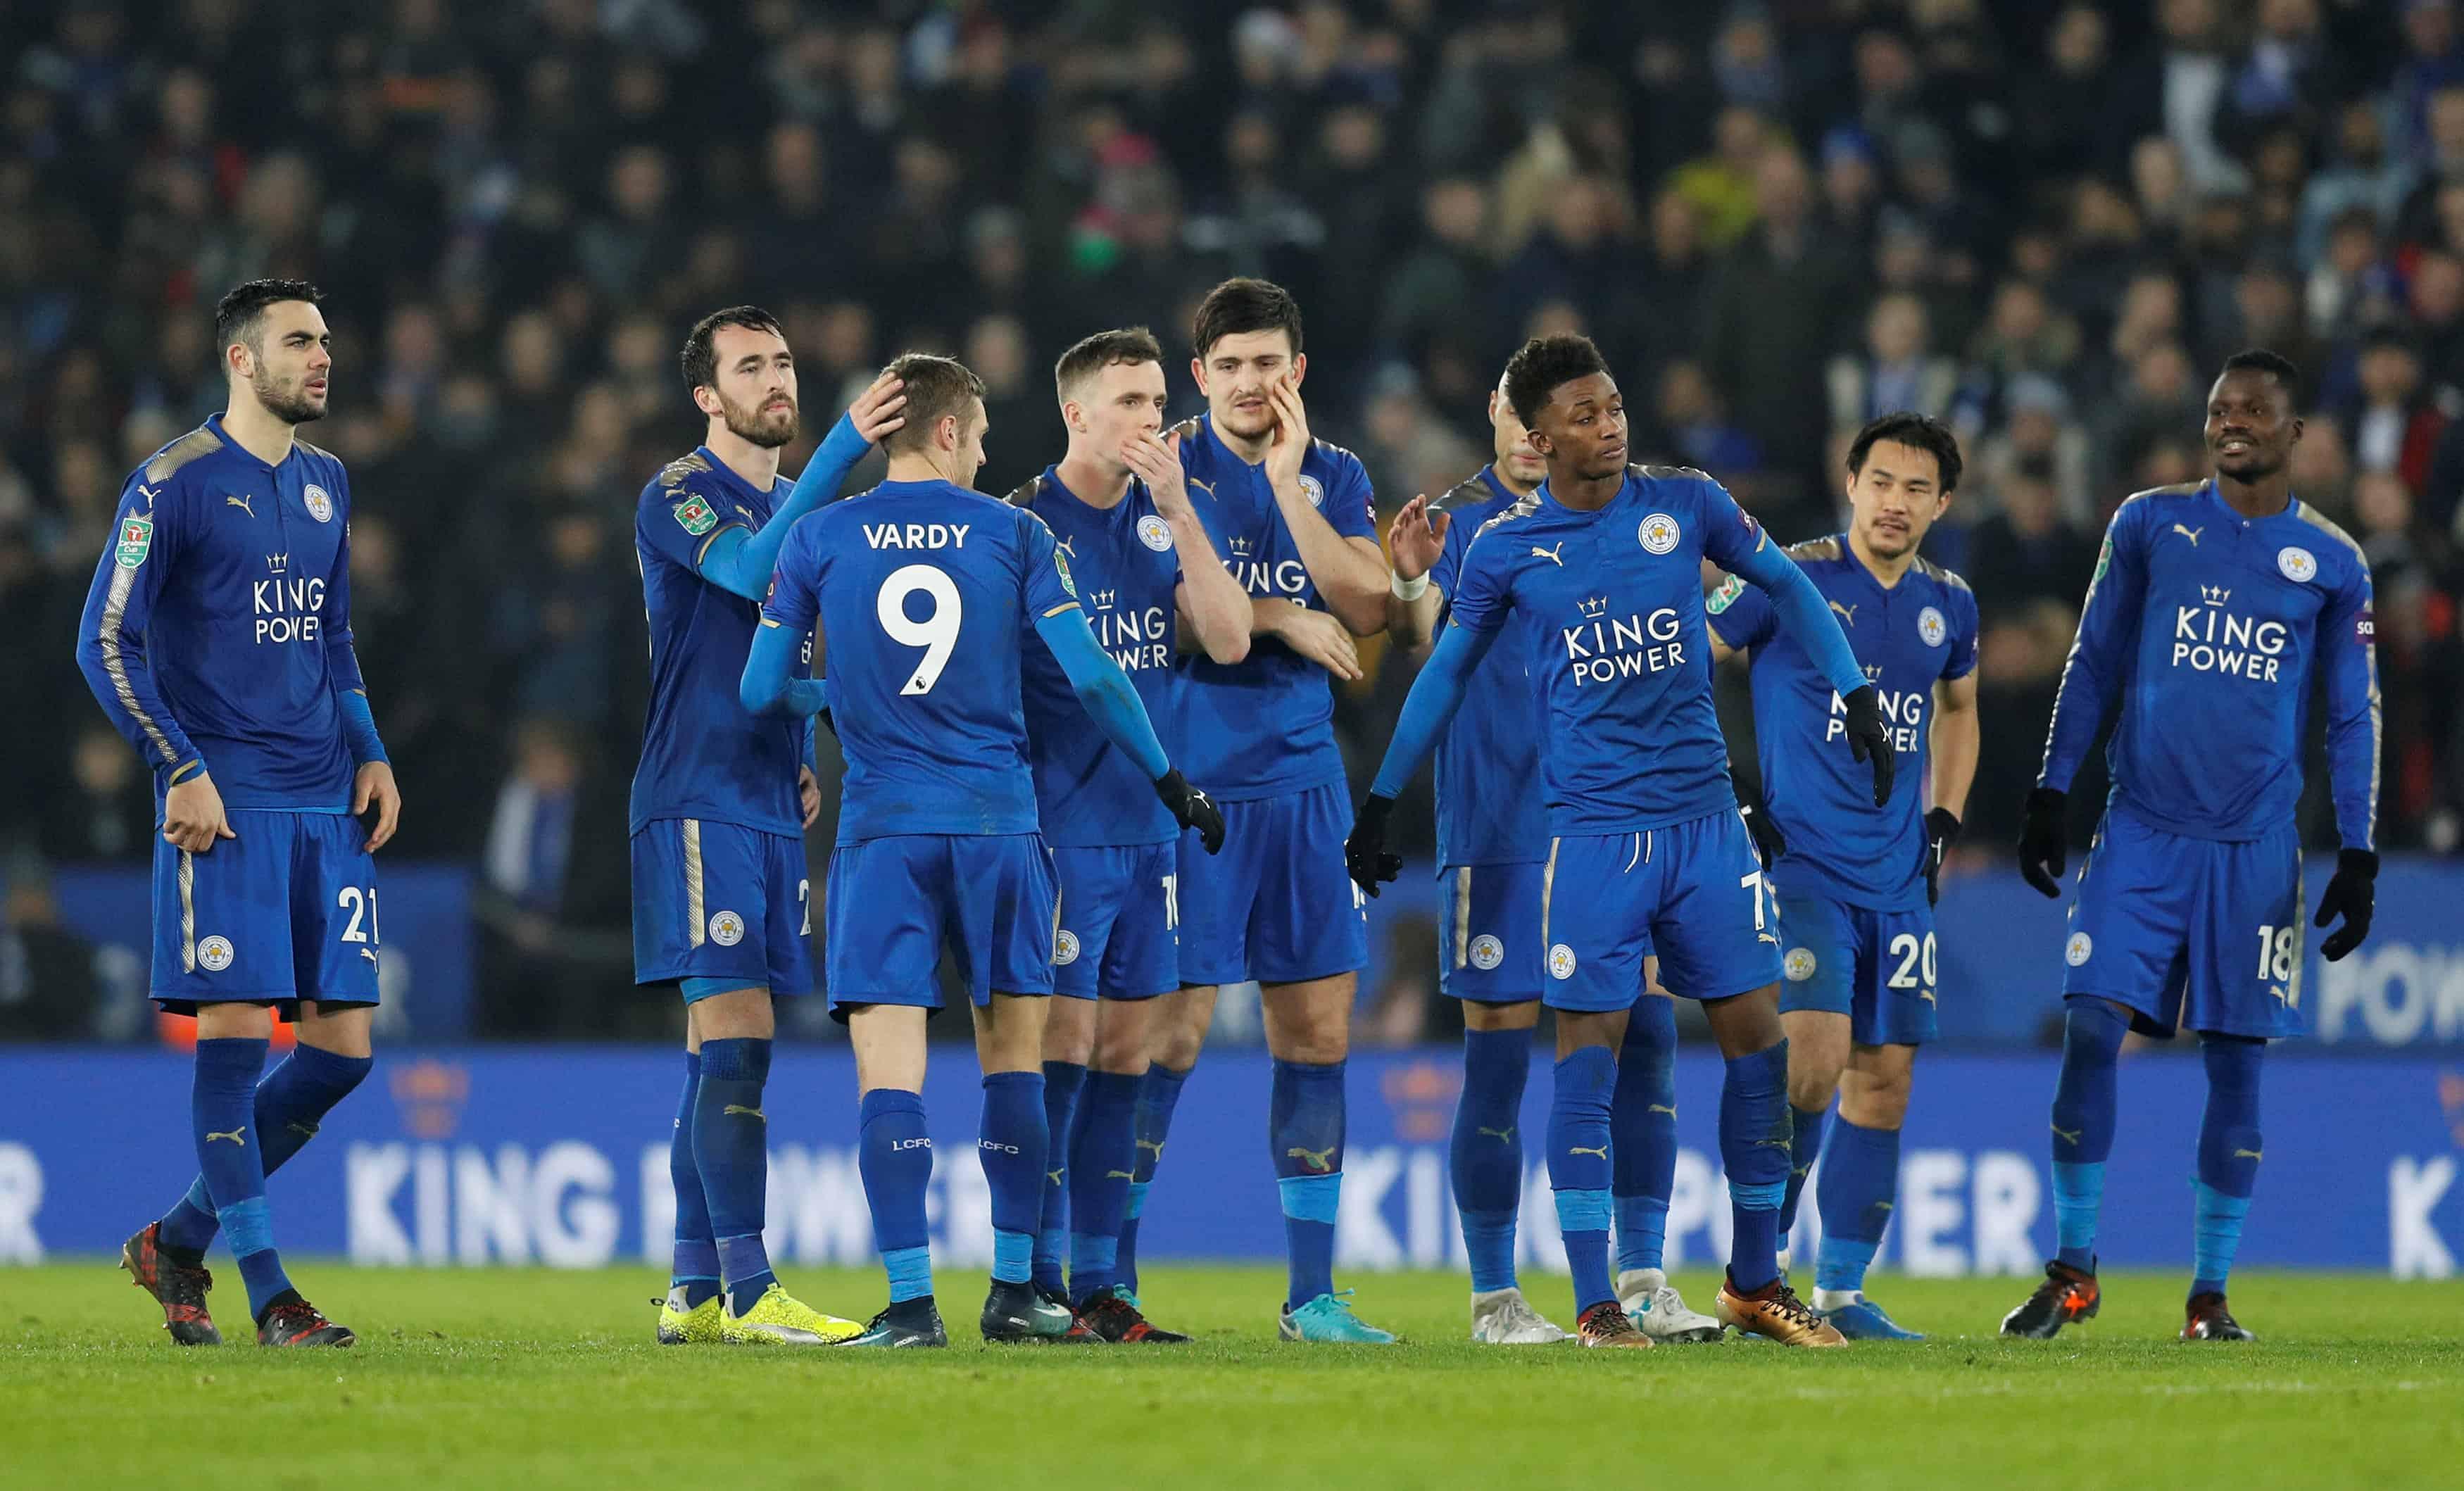 Fotboll, Engelska Ligacupen, kvartsfinal, Leicester - Manchester City